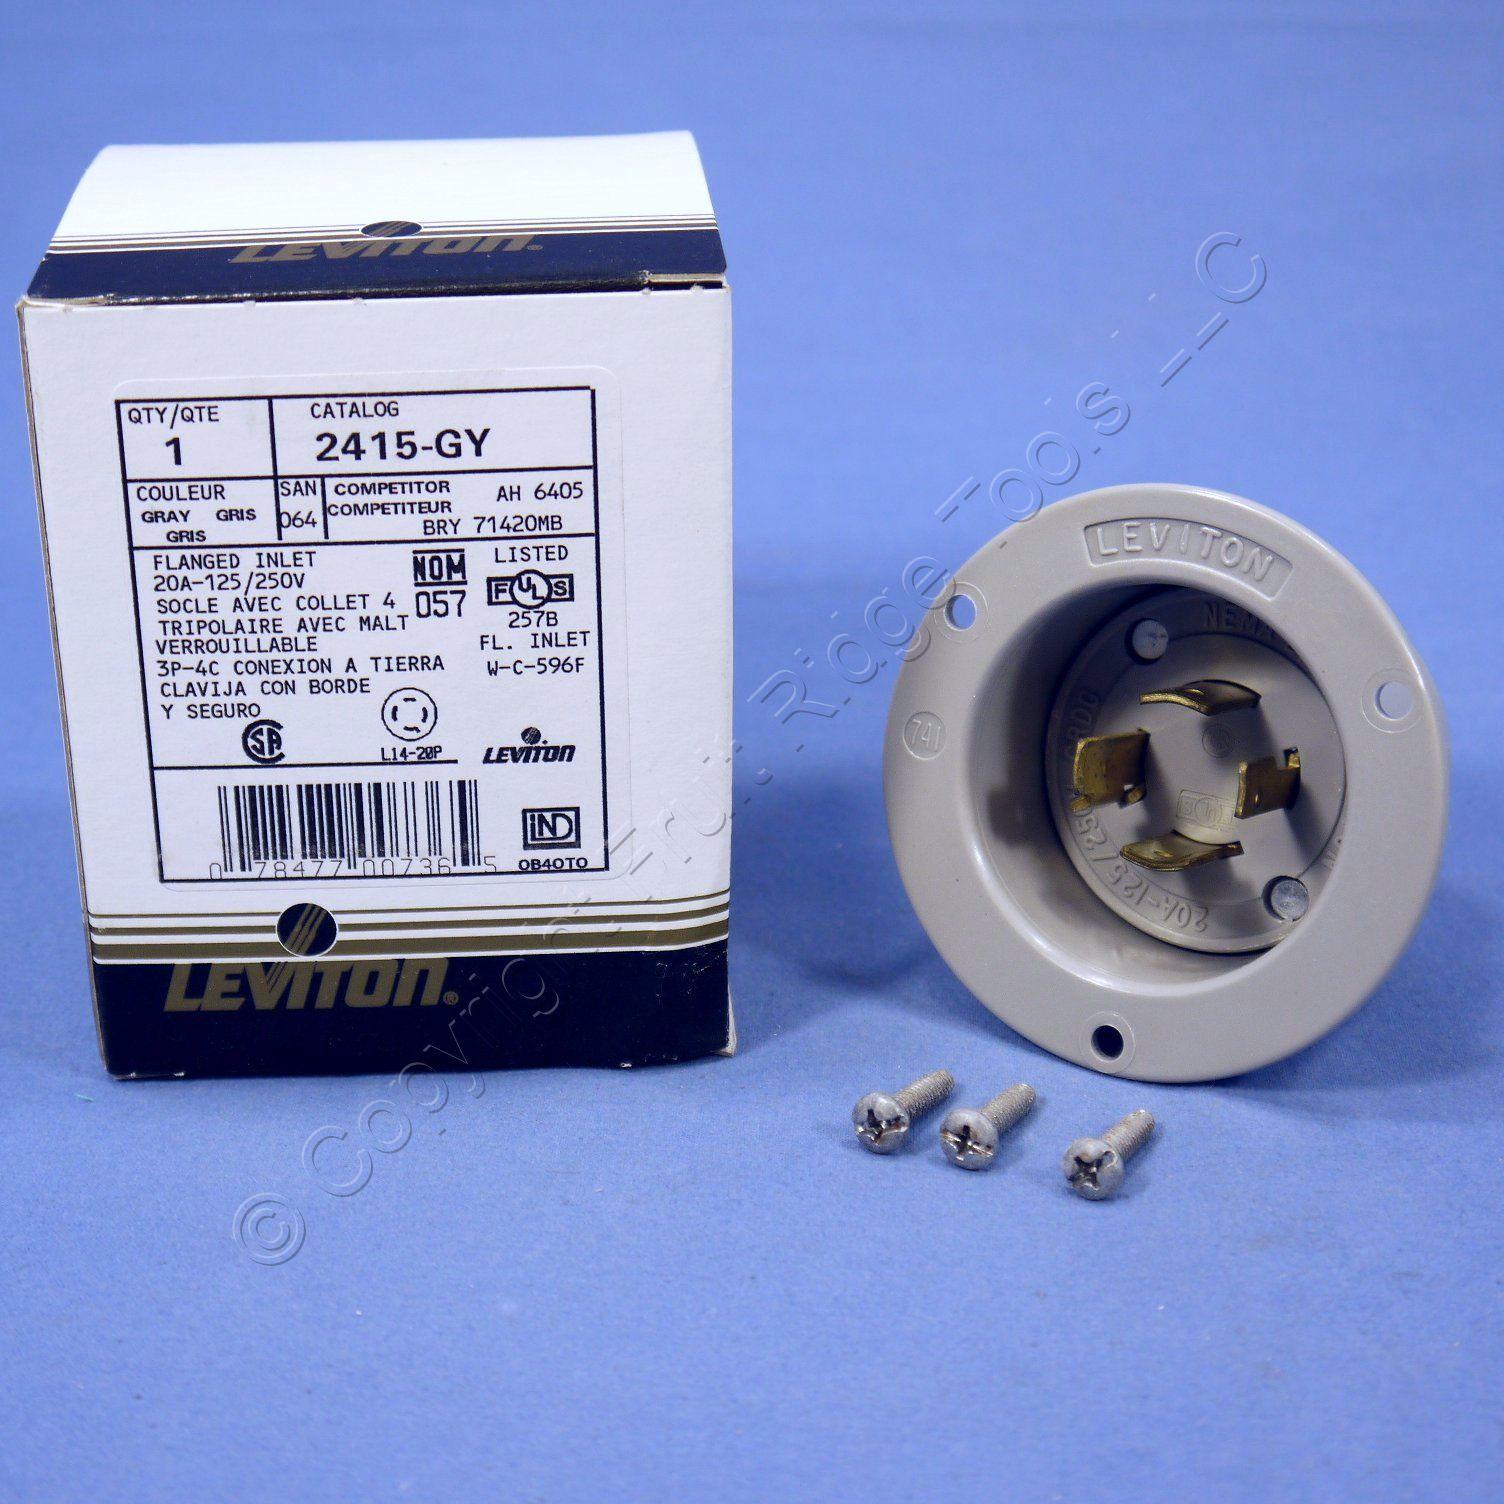 hight resolution of leviton gray l14 20p locking flanged inlet turn twist plug 20a 125 250v 2415 gy